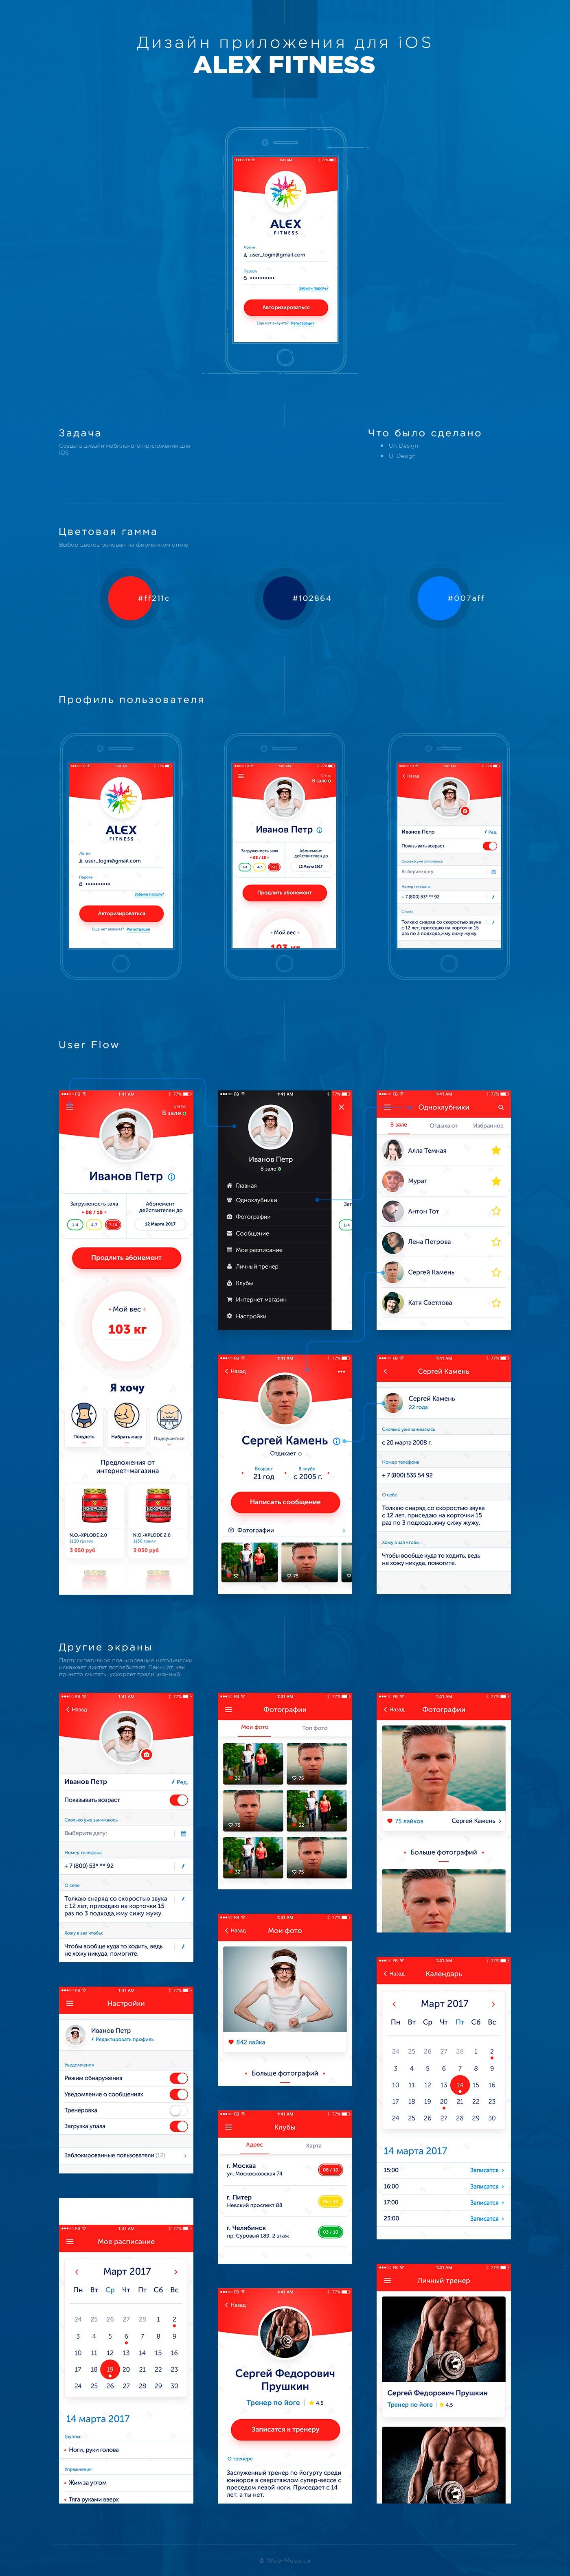 Alex Fitness UI/UX IOS App